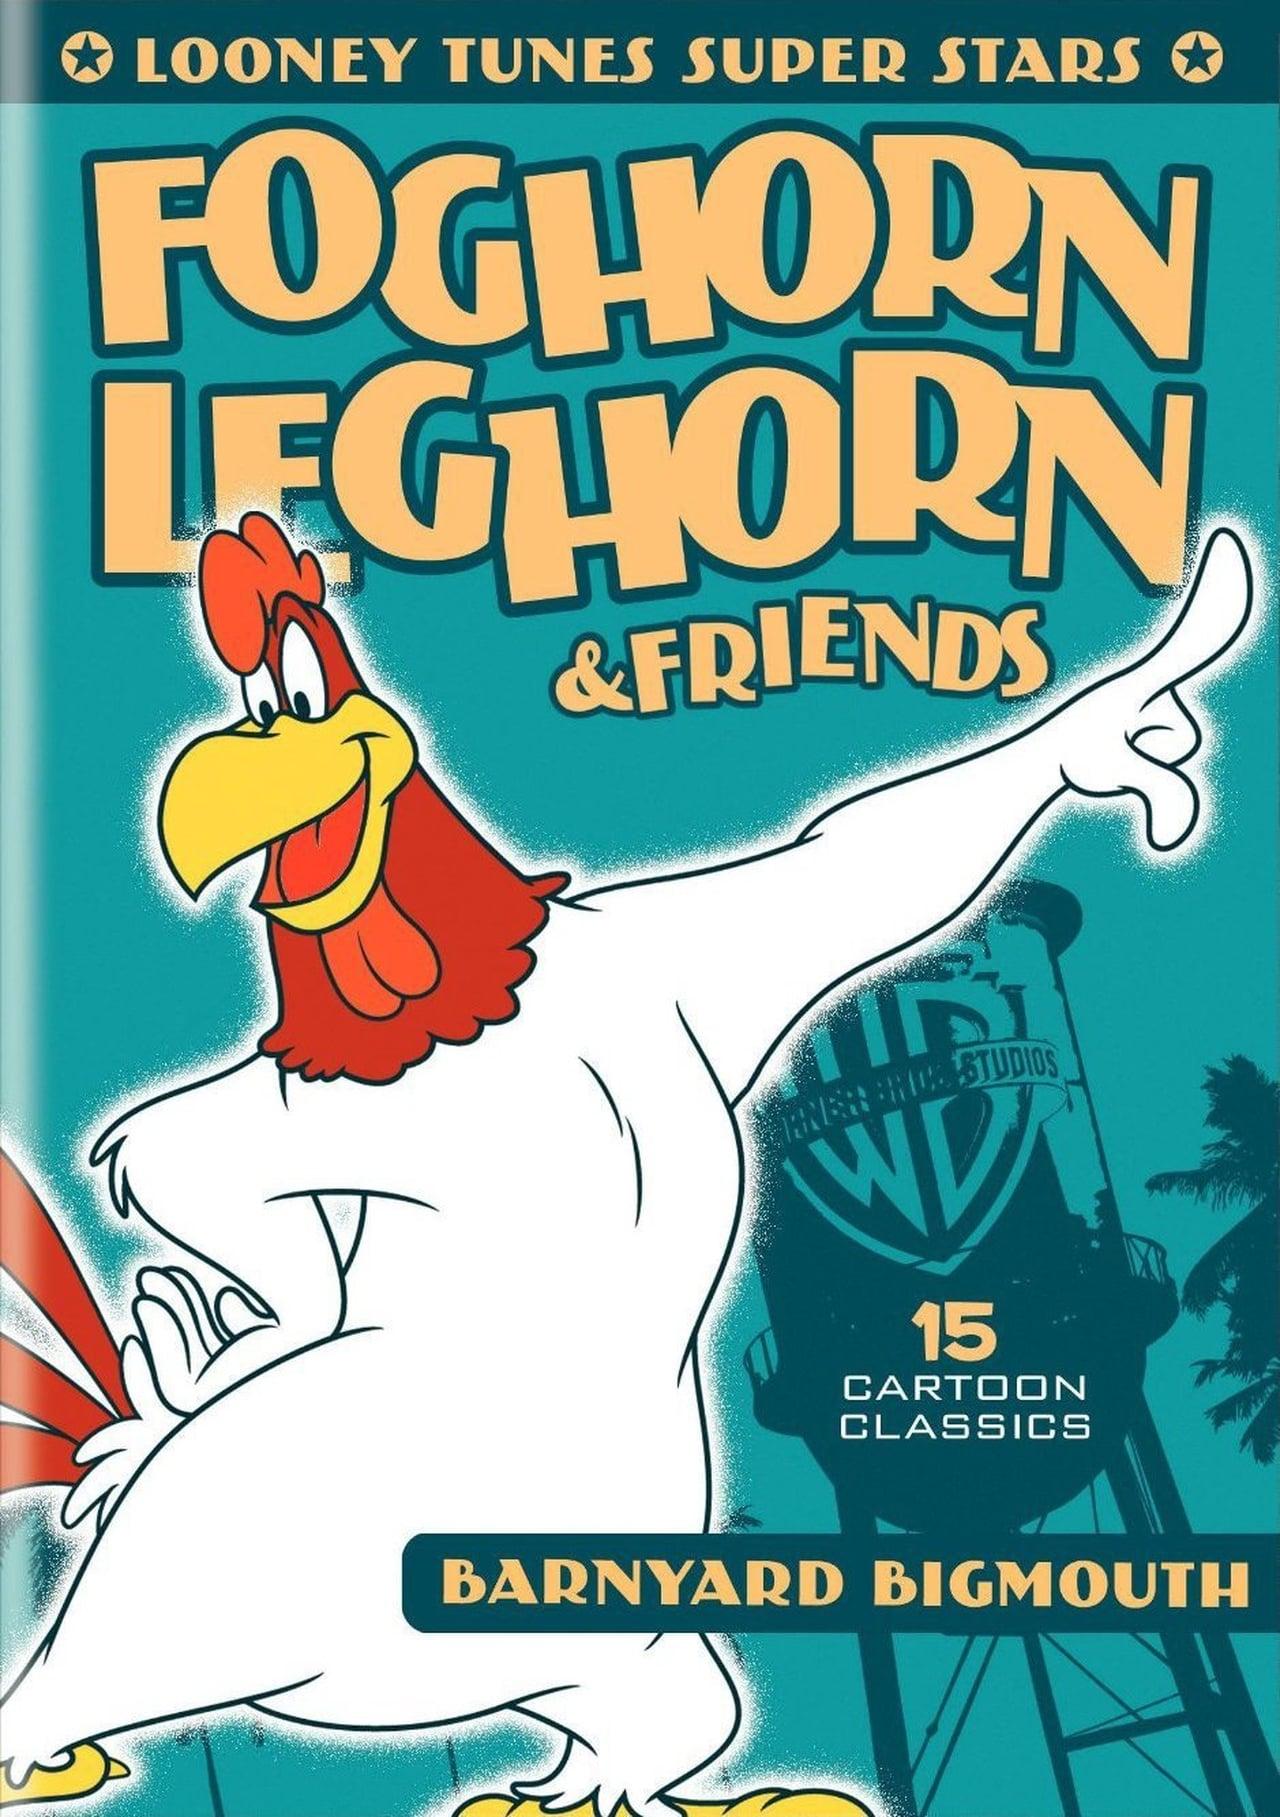 Looney Tunes Super Stars Foghorn Leghorn & Friends: Barnyard Bigmouth